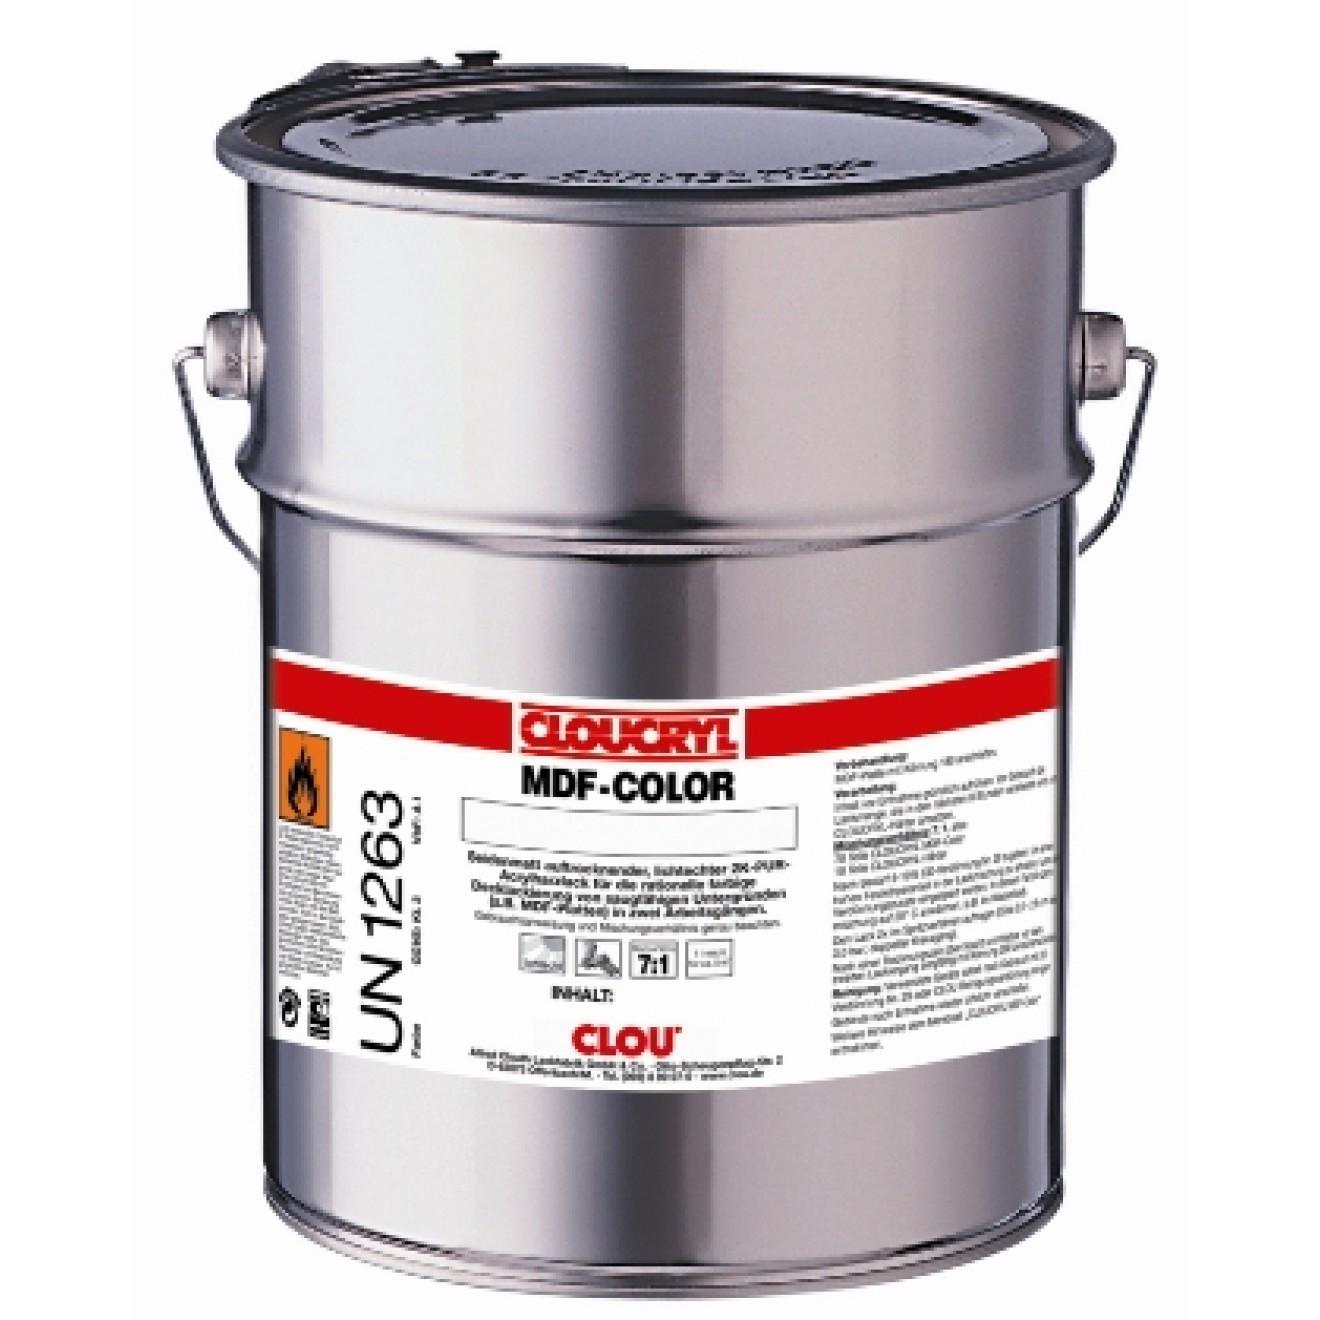 Cloucryl mdf color farbige gestaltung von saugf higen for Mdf colors